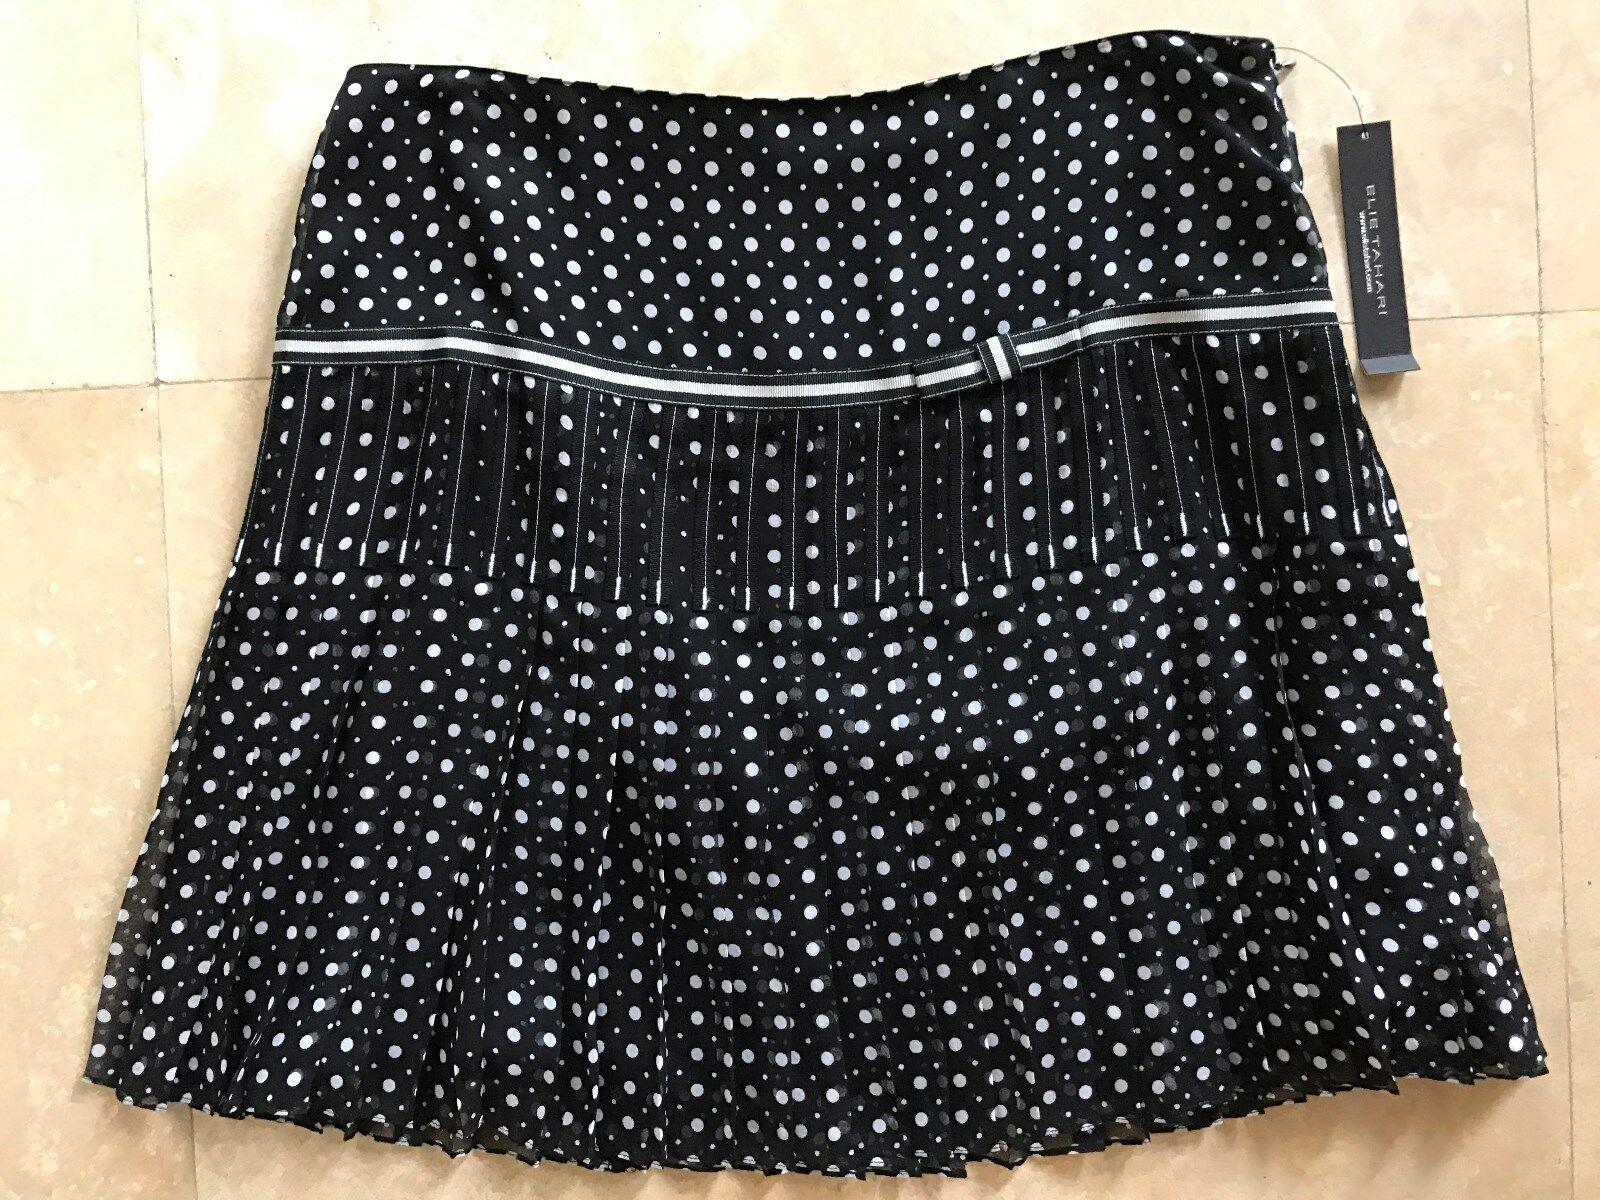 NEW  Elie Tahari  198 Women's Polka Dot Pleated Mini Skirt Silk Lined Size 8